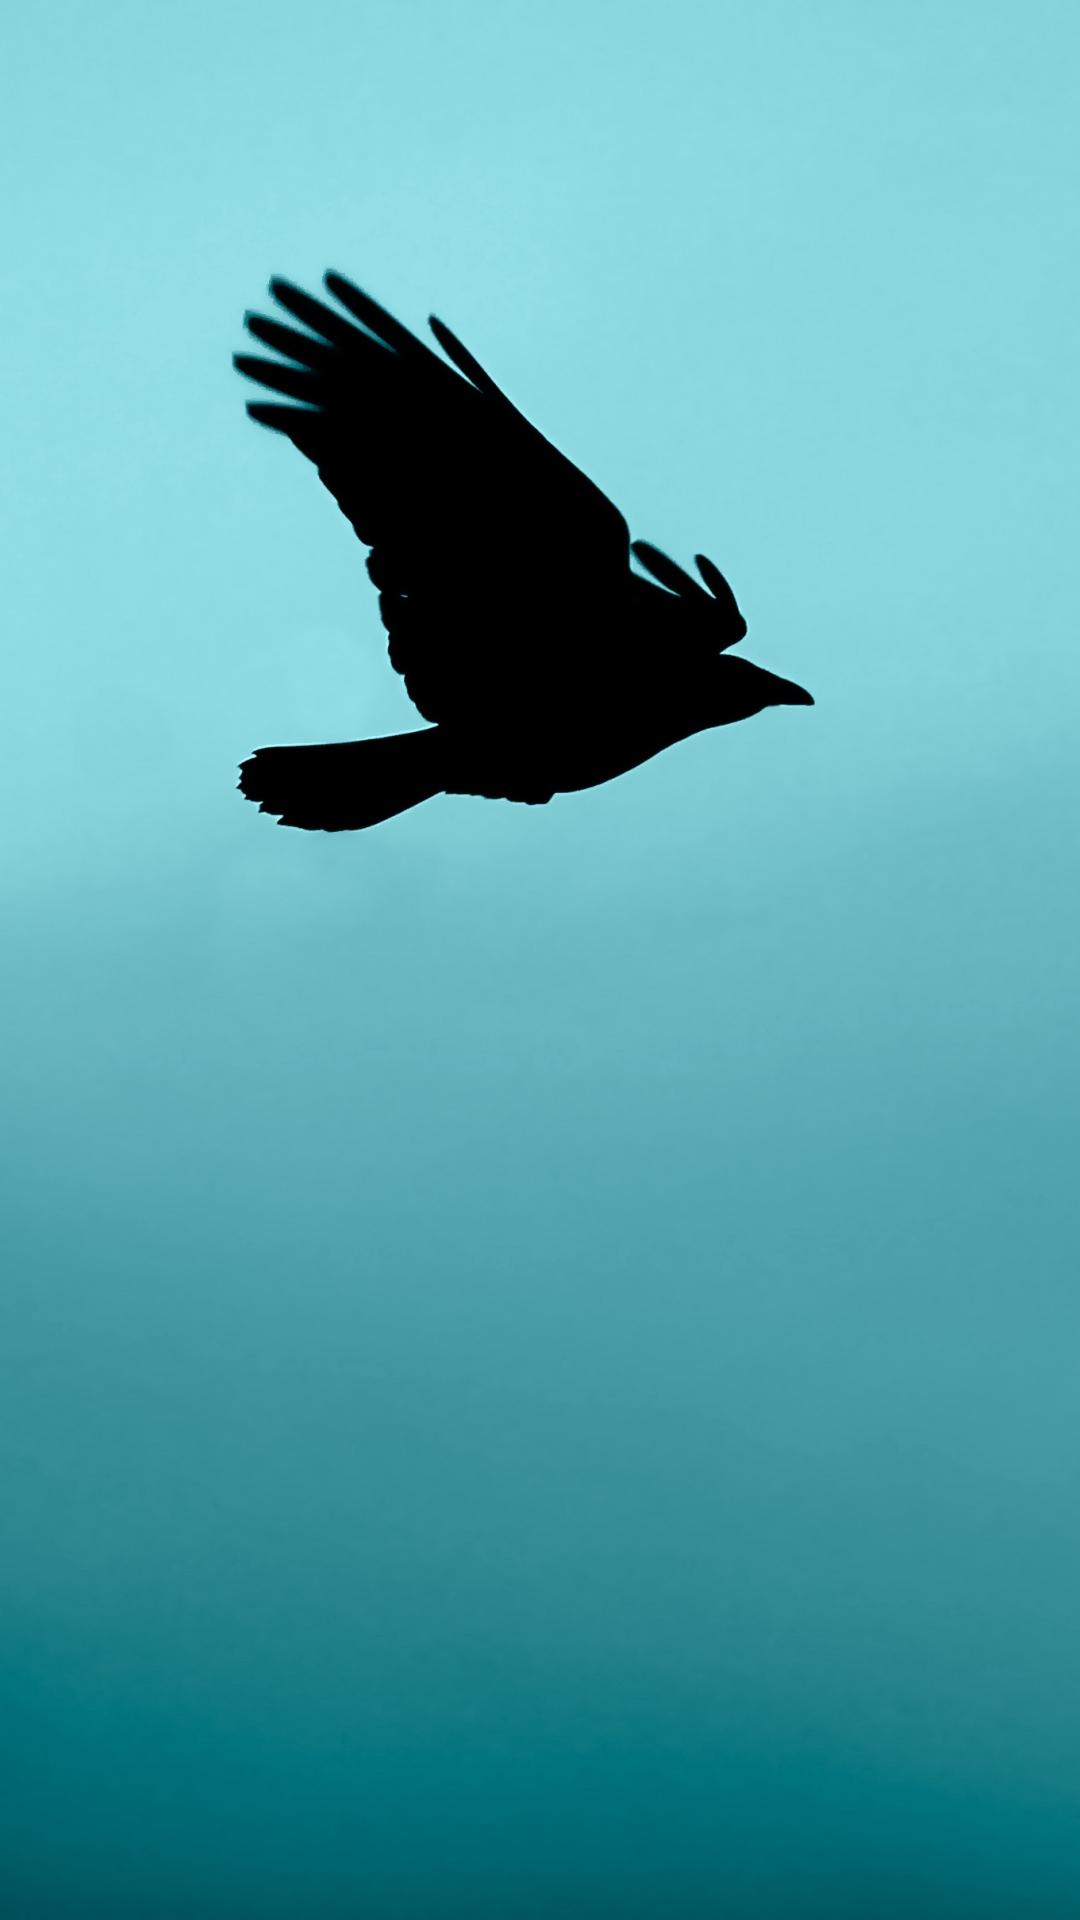 bird flight silhouette Bird